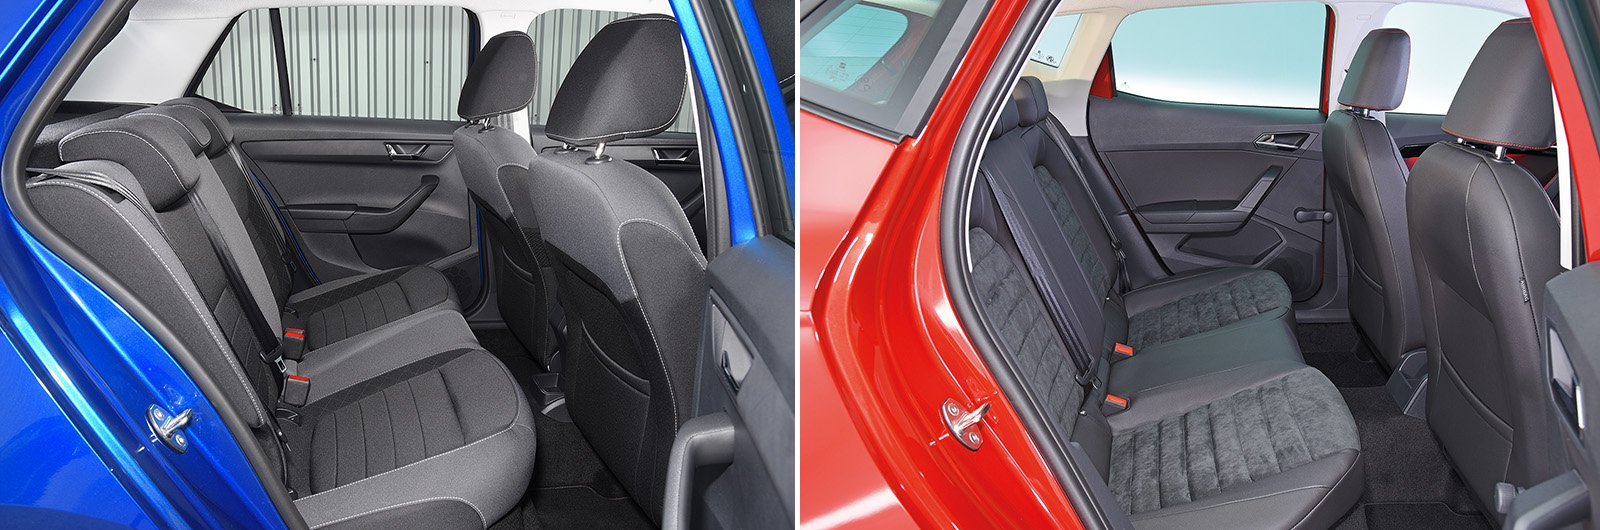 New Skoda Fabia vs used Seat Ibiza